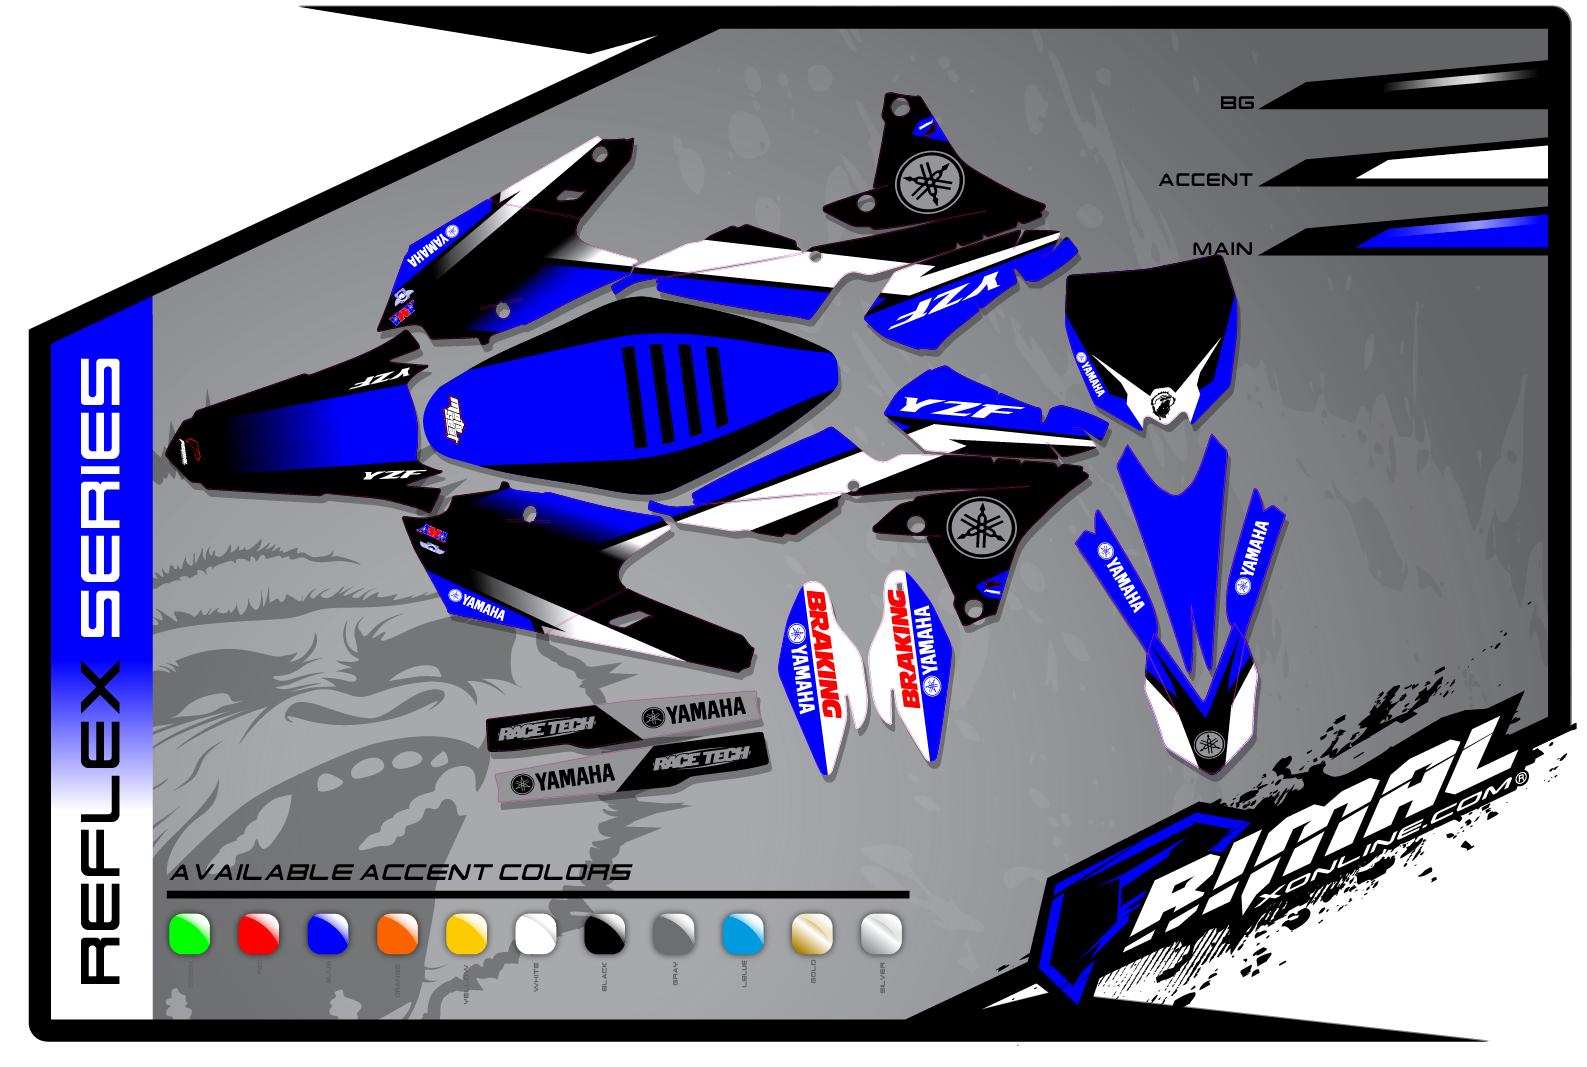 primal-x-motorsports-mx-graphics-yamaha-yzf-450-reflex-series-motocross-graphics